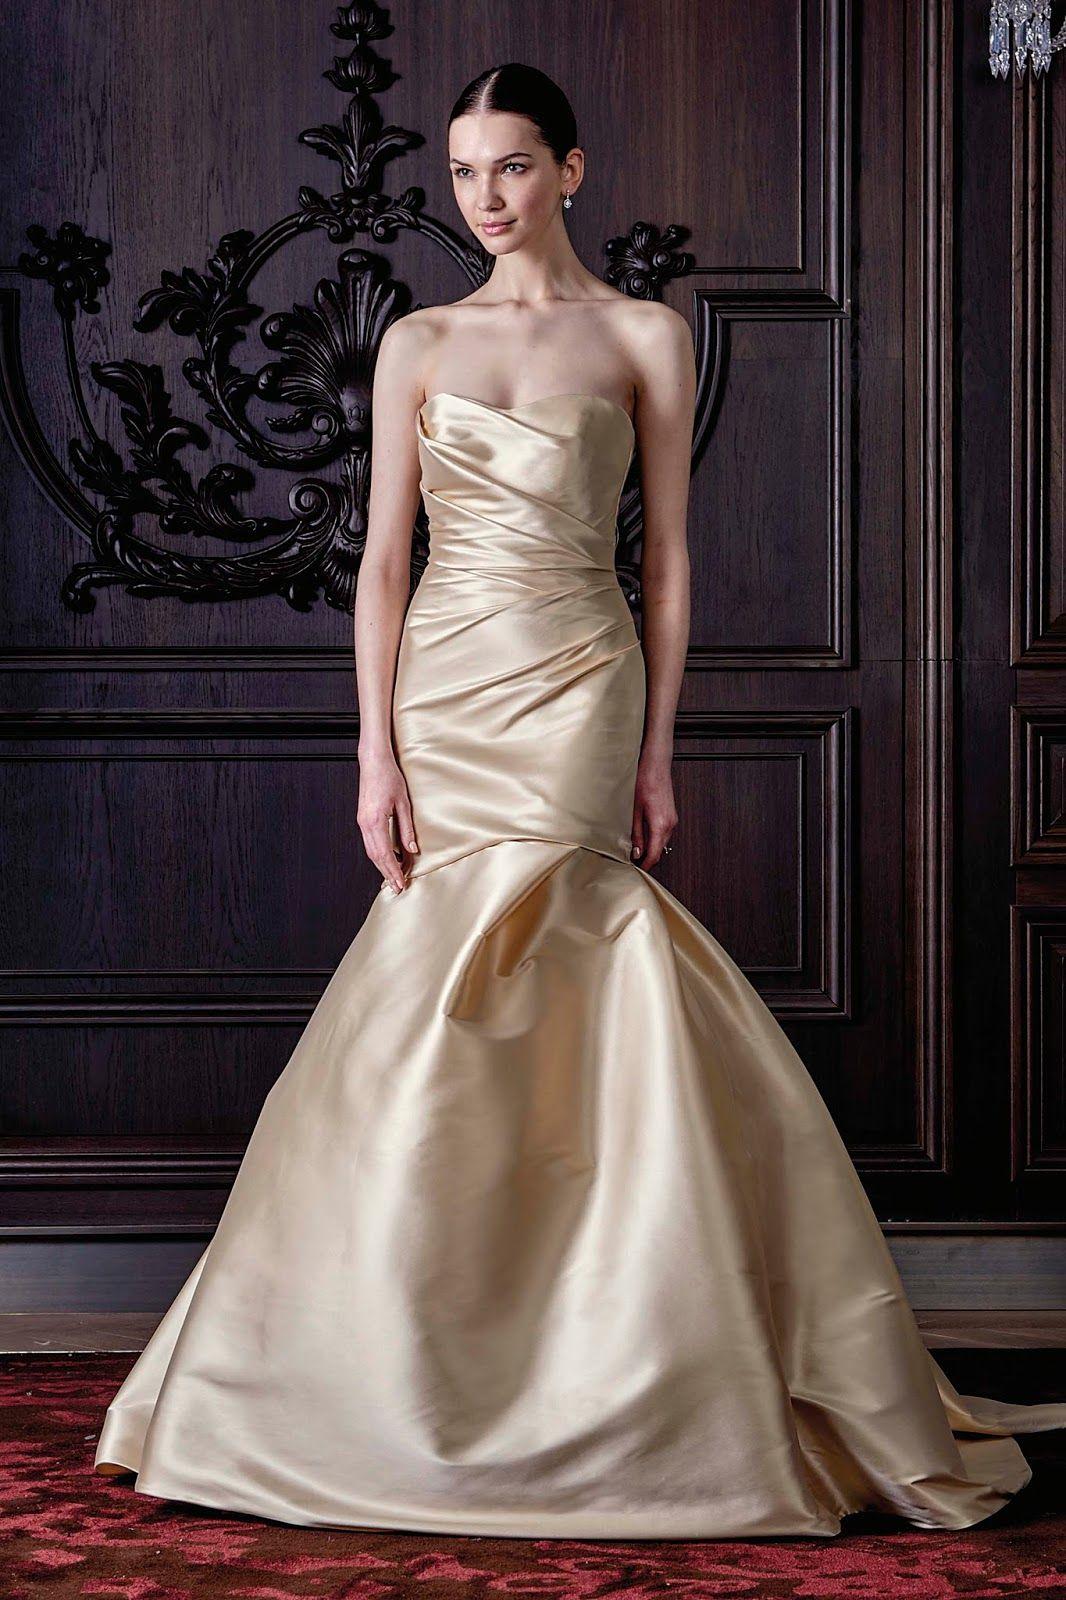 Monique Lhuillier Spring 2016 Wedding Collection. Hot